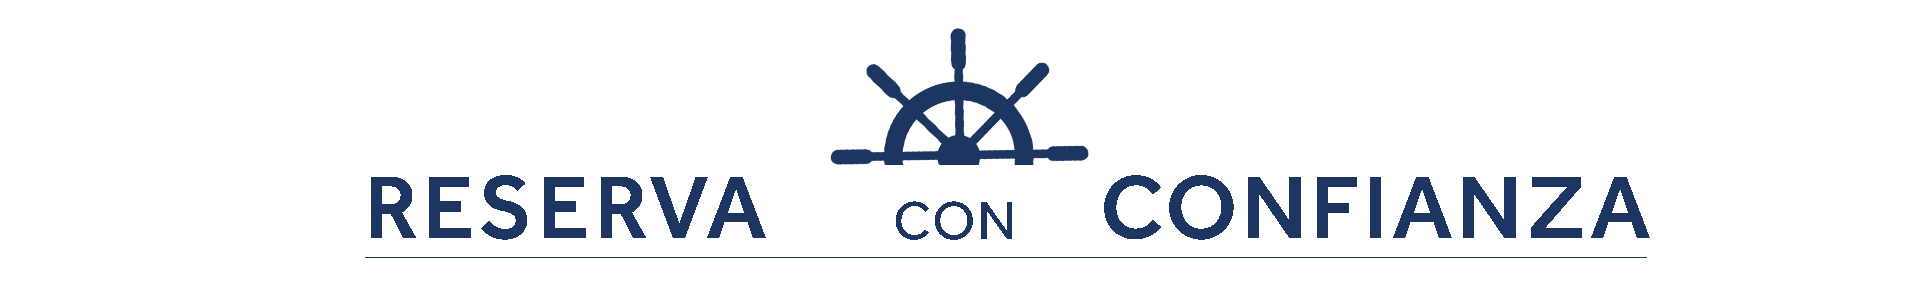 Navego con total confianza